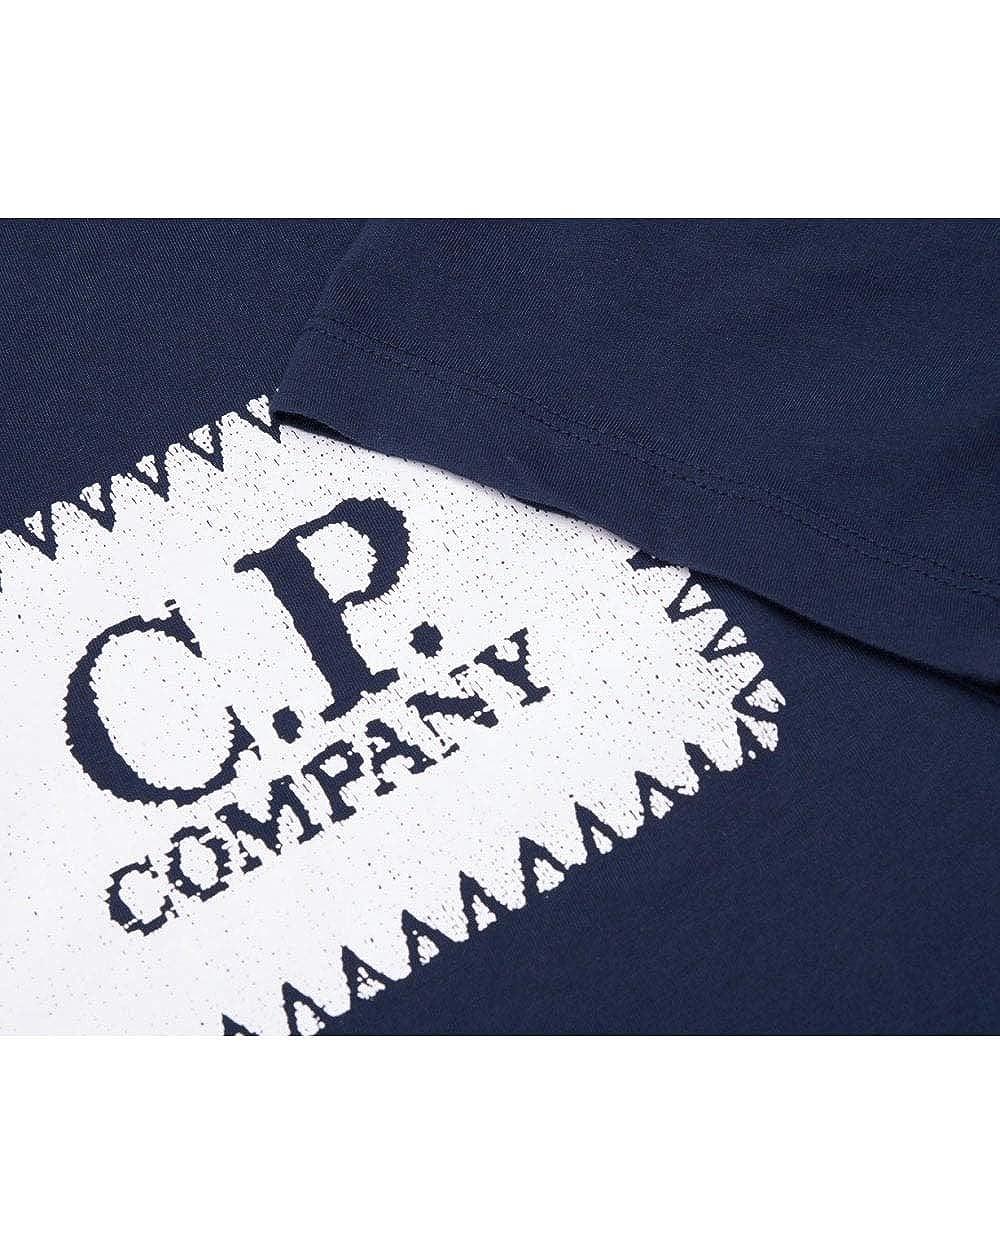 CP Company Box Logo T Shirt in Navy